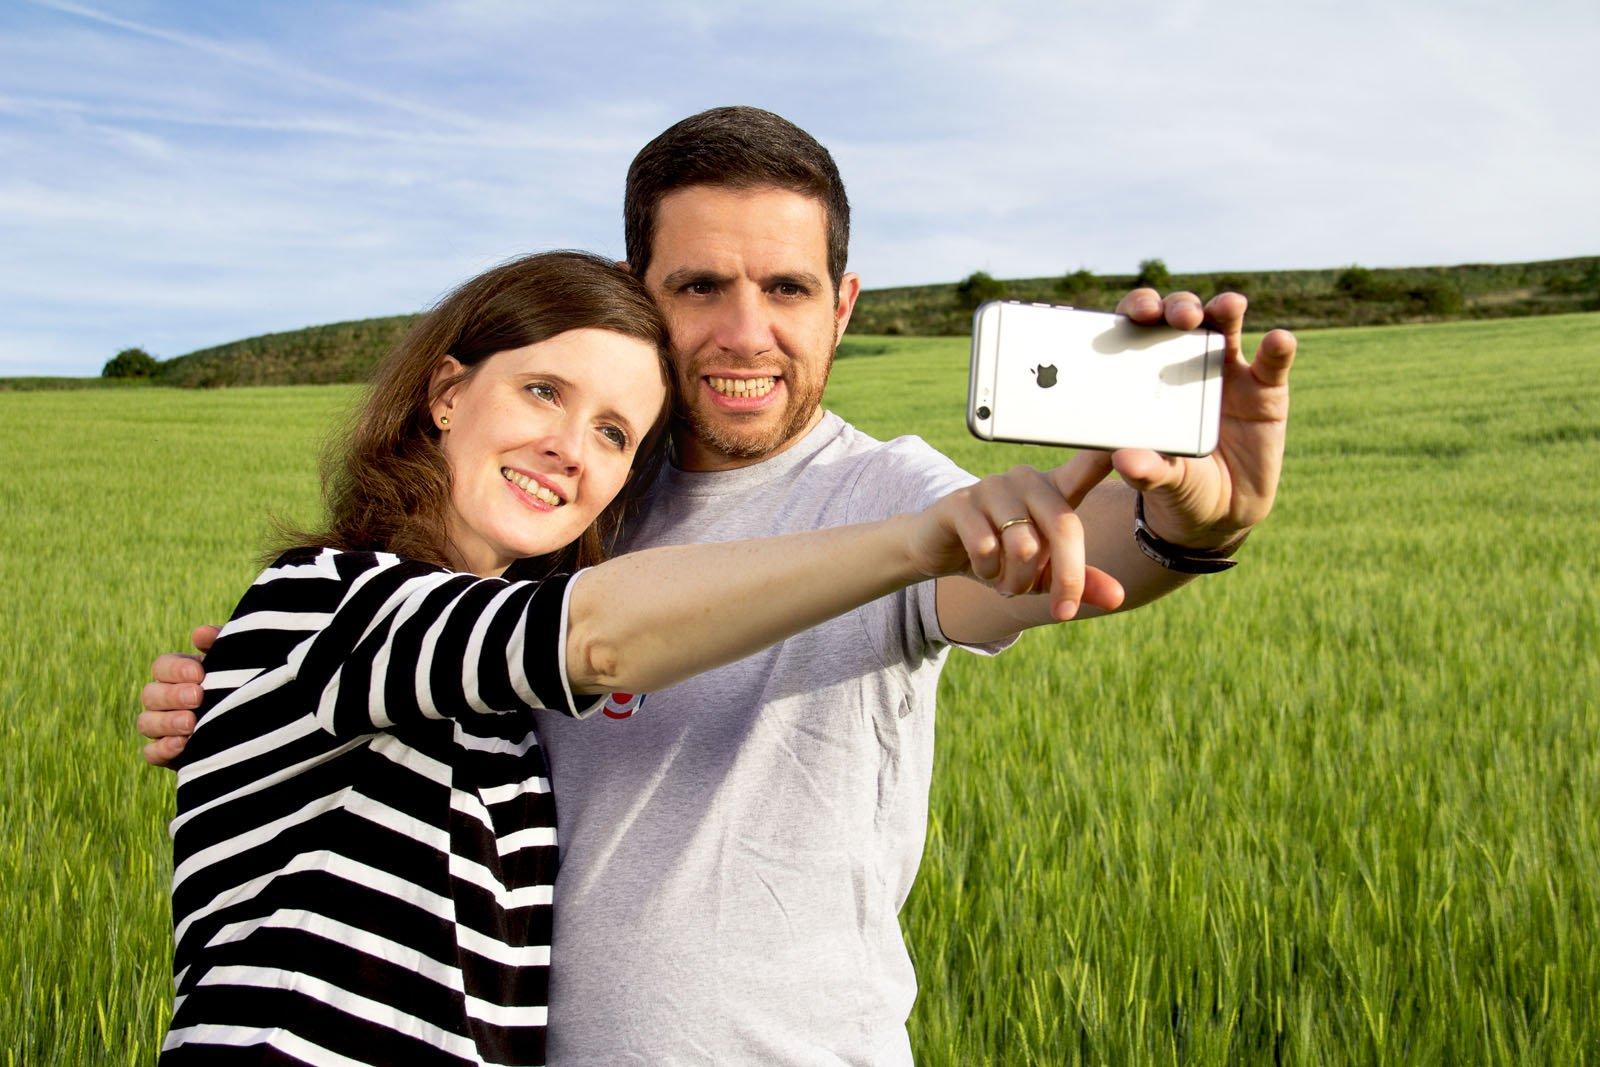 matrimonioenpositivo relaciones de pareja